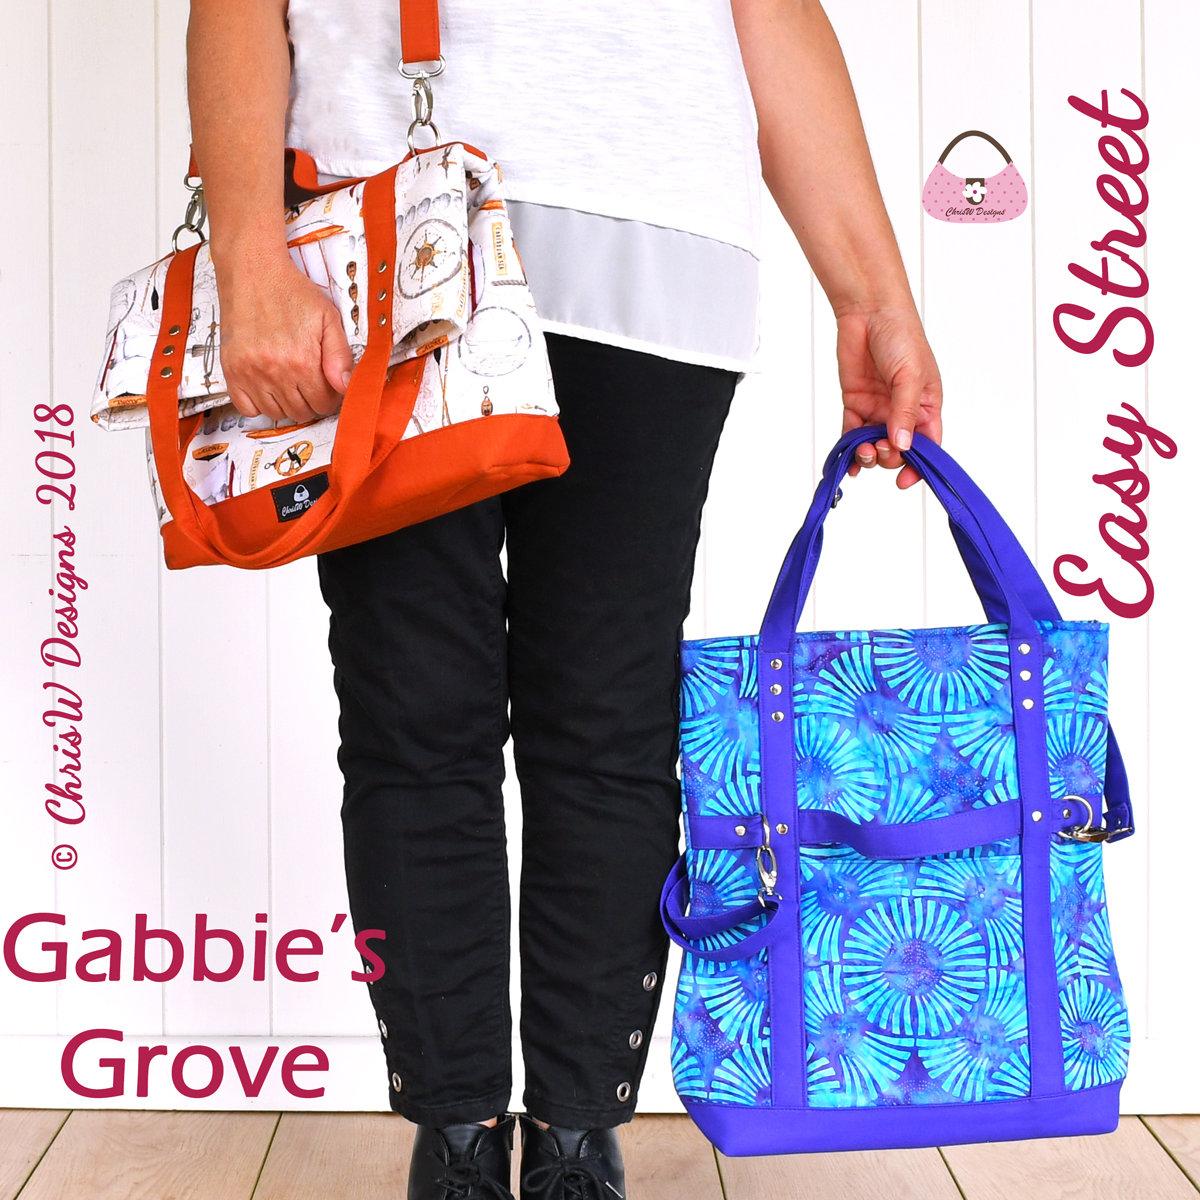 Gabbie's Grove ESGG18